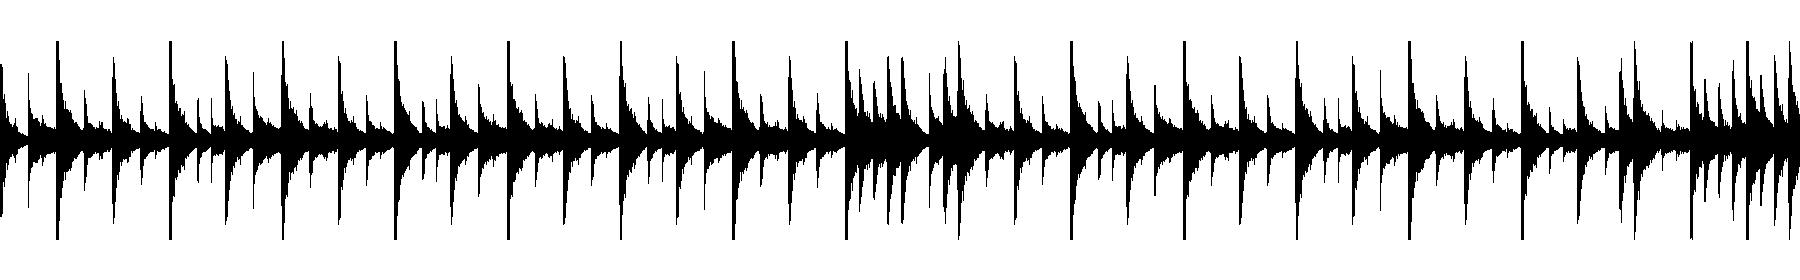 110 drums 02 sp